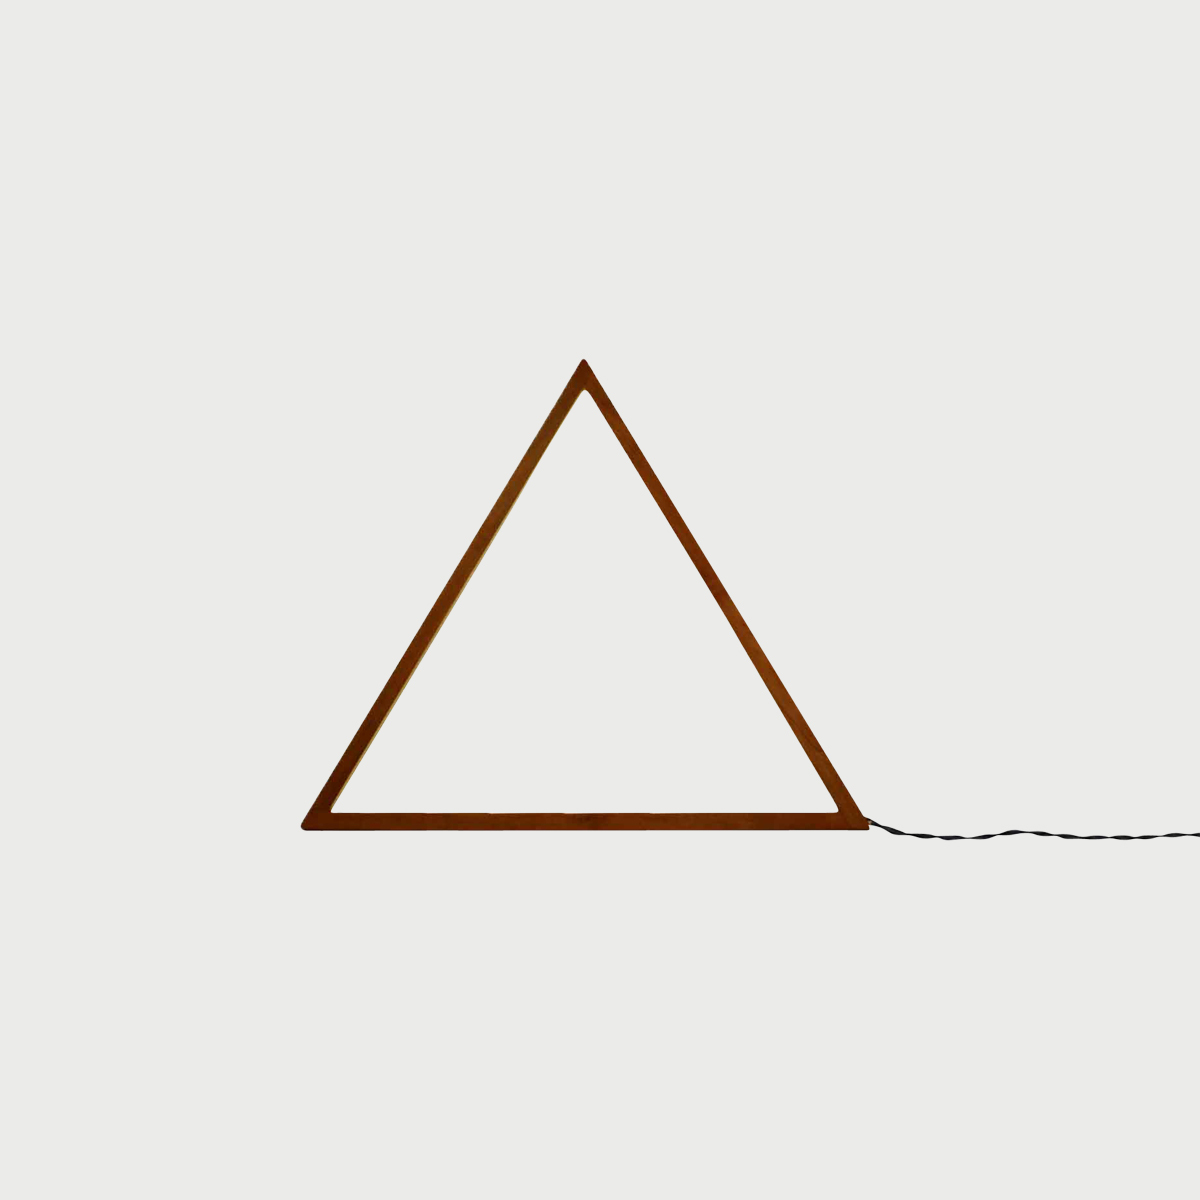 Cherry triangle cutout